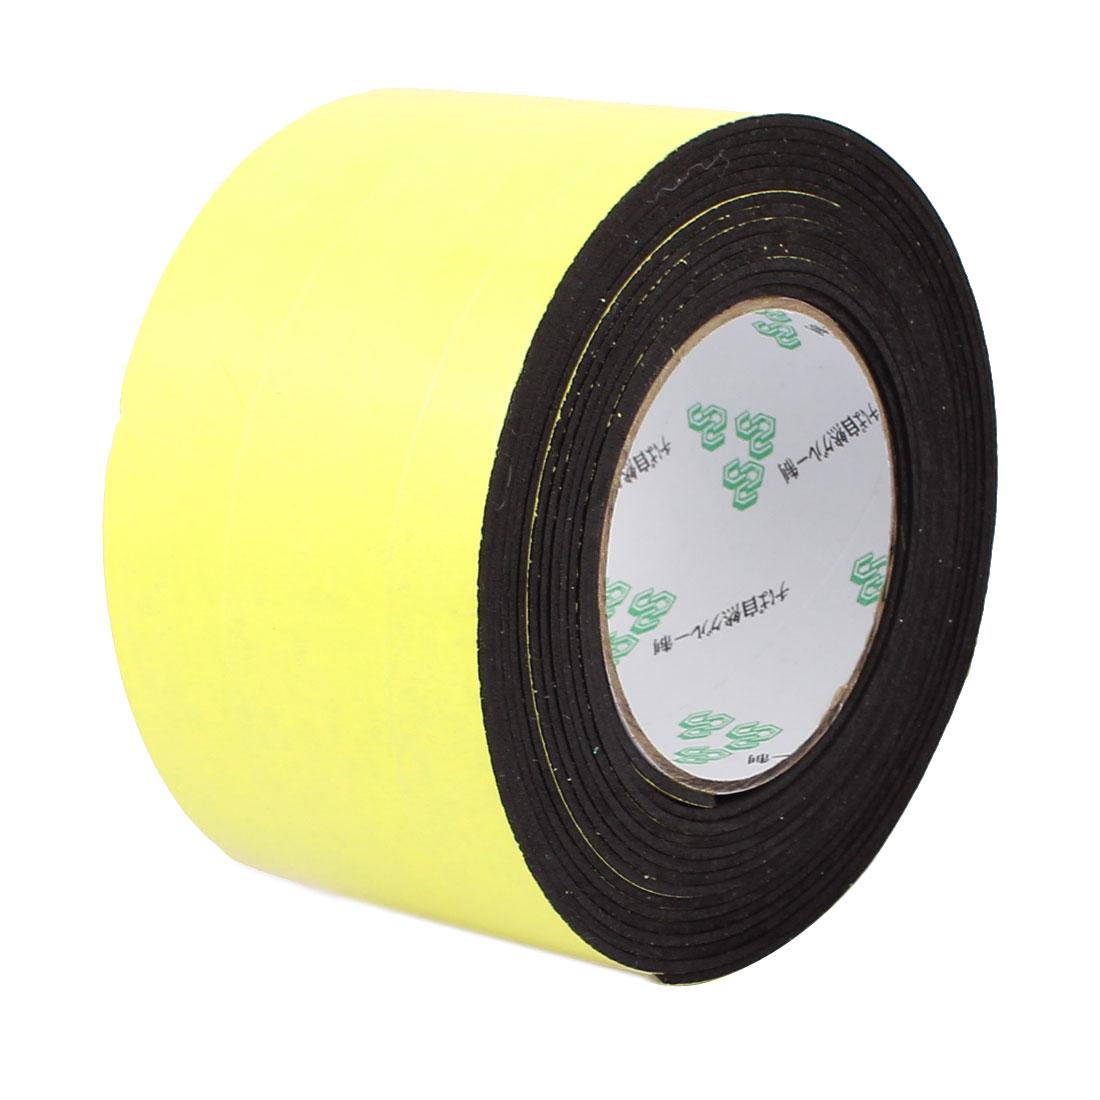 80mm x 2mm Single Sided Self Adhesive Shockproof Sponge Foam Tape 5M Length